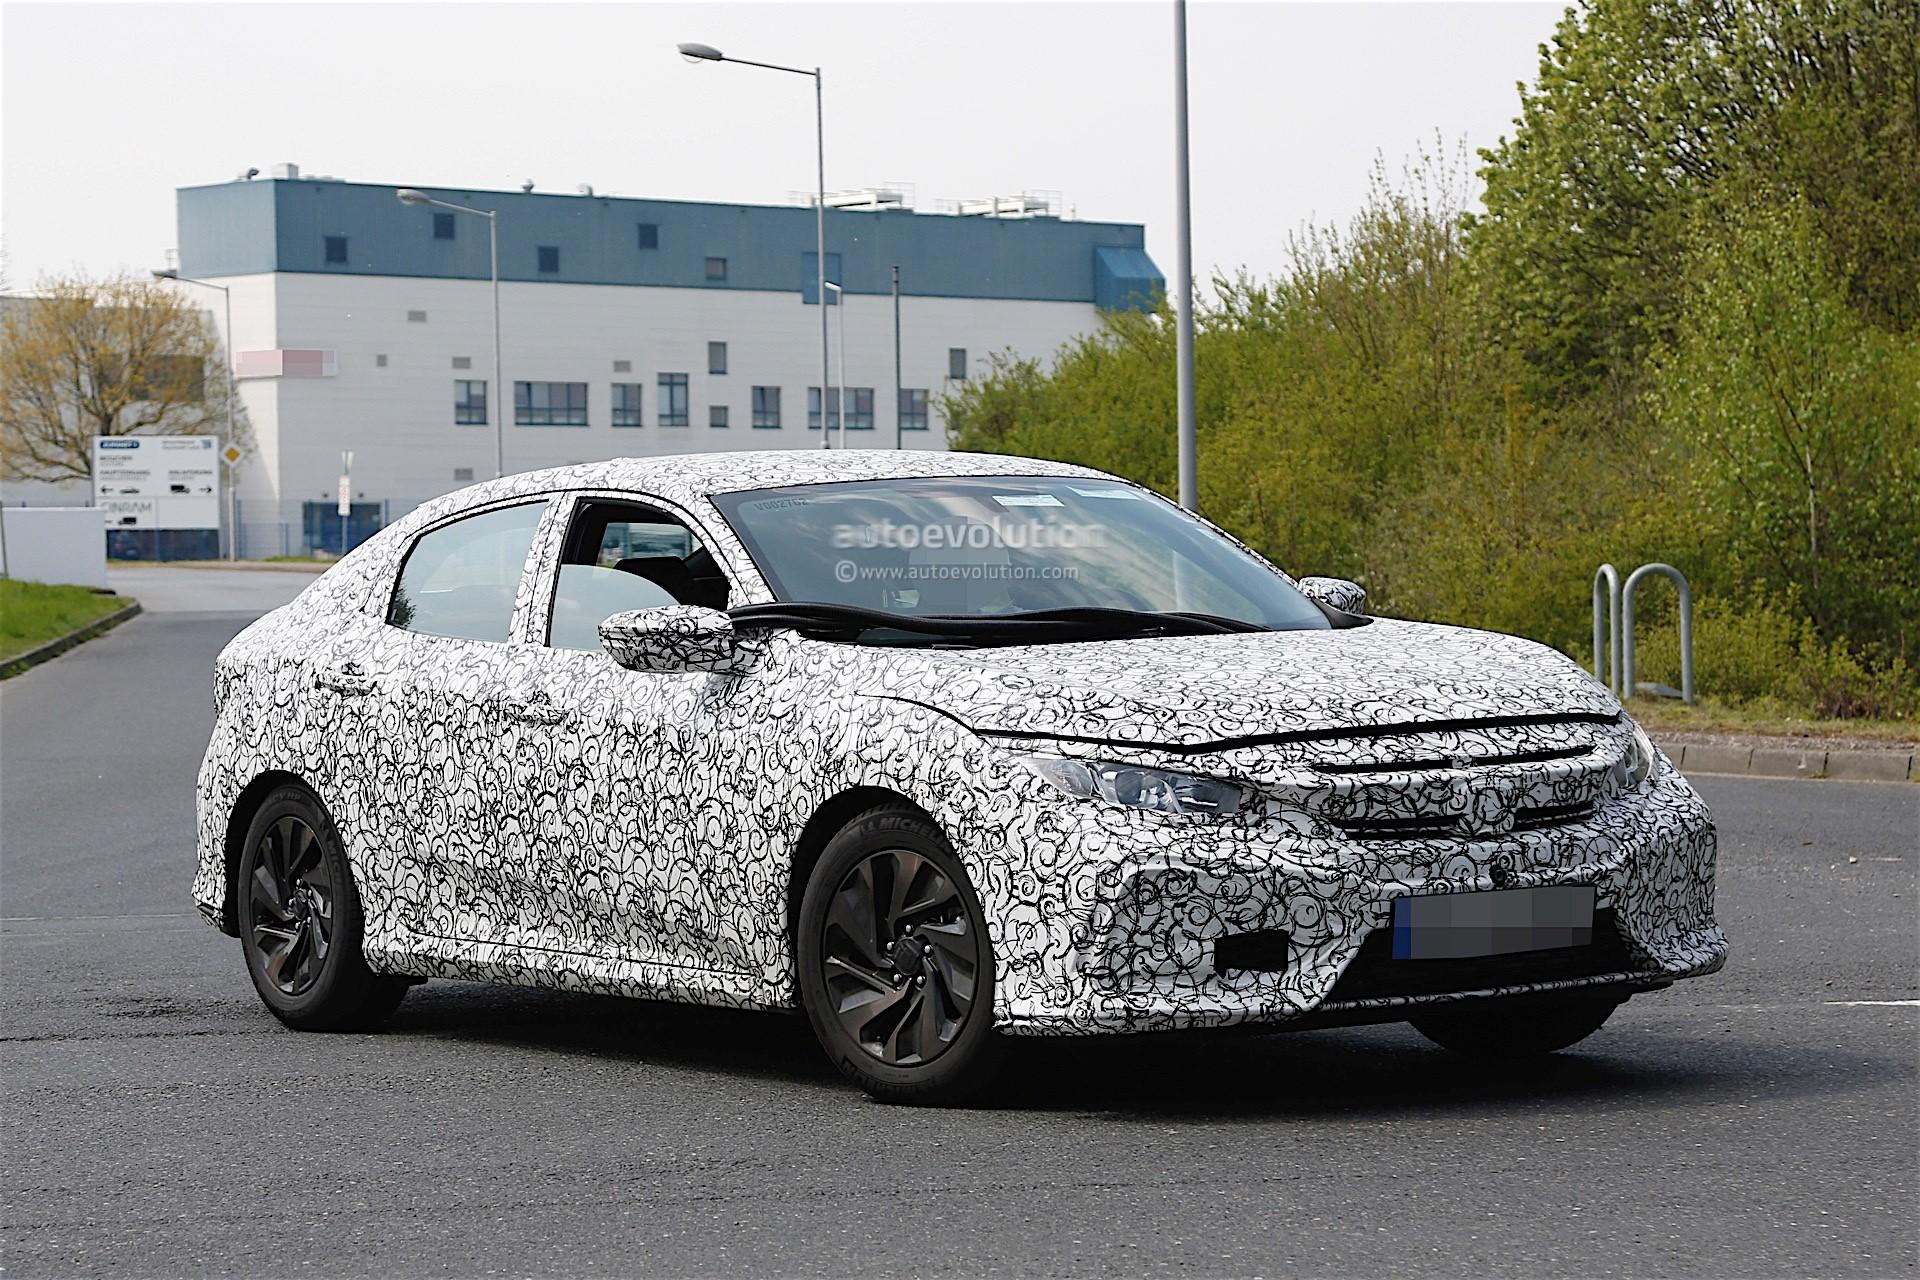 2017 Honda Civic Spyshots Reveal